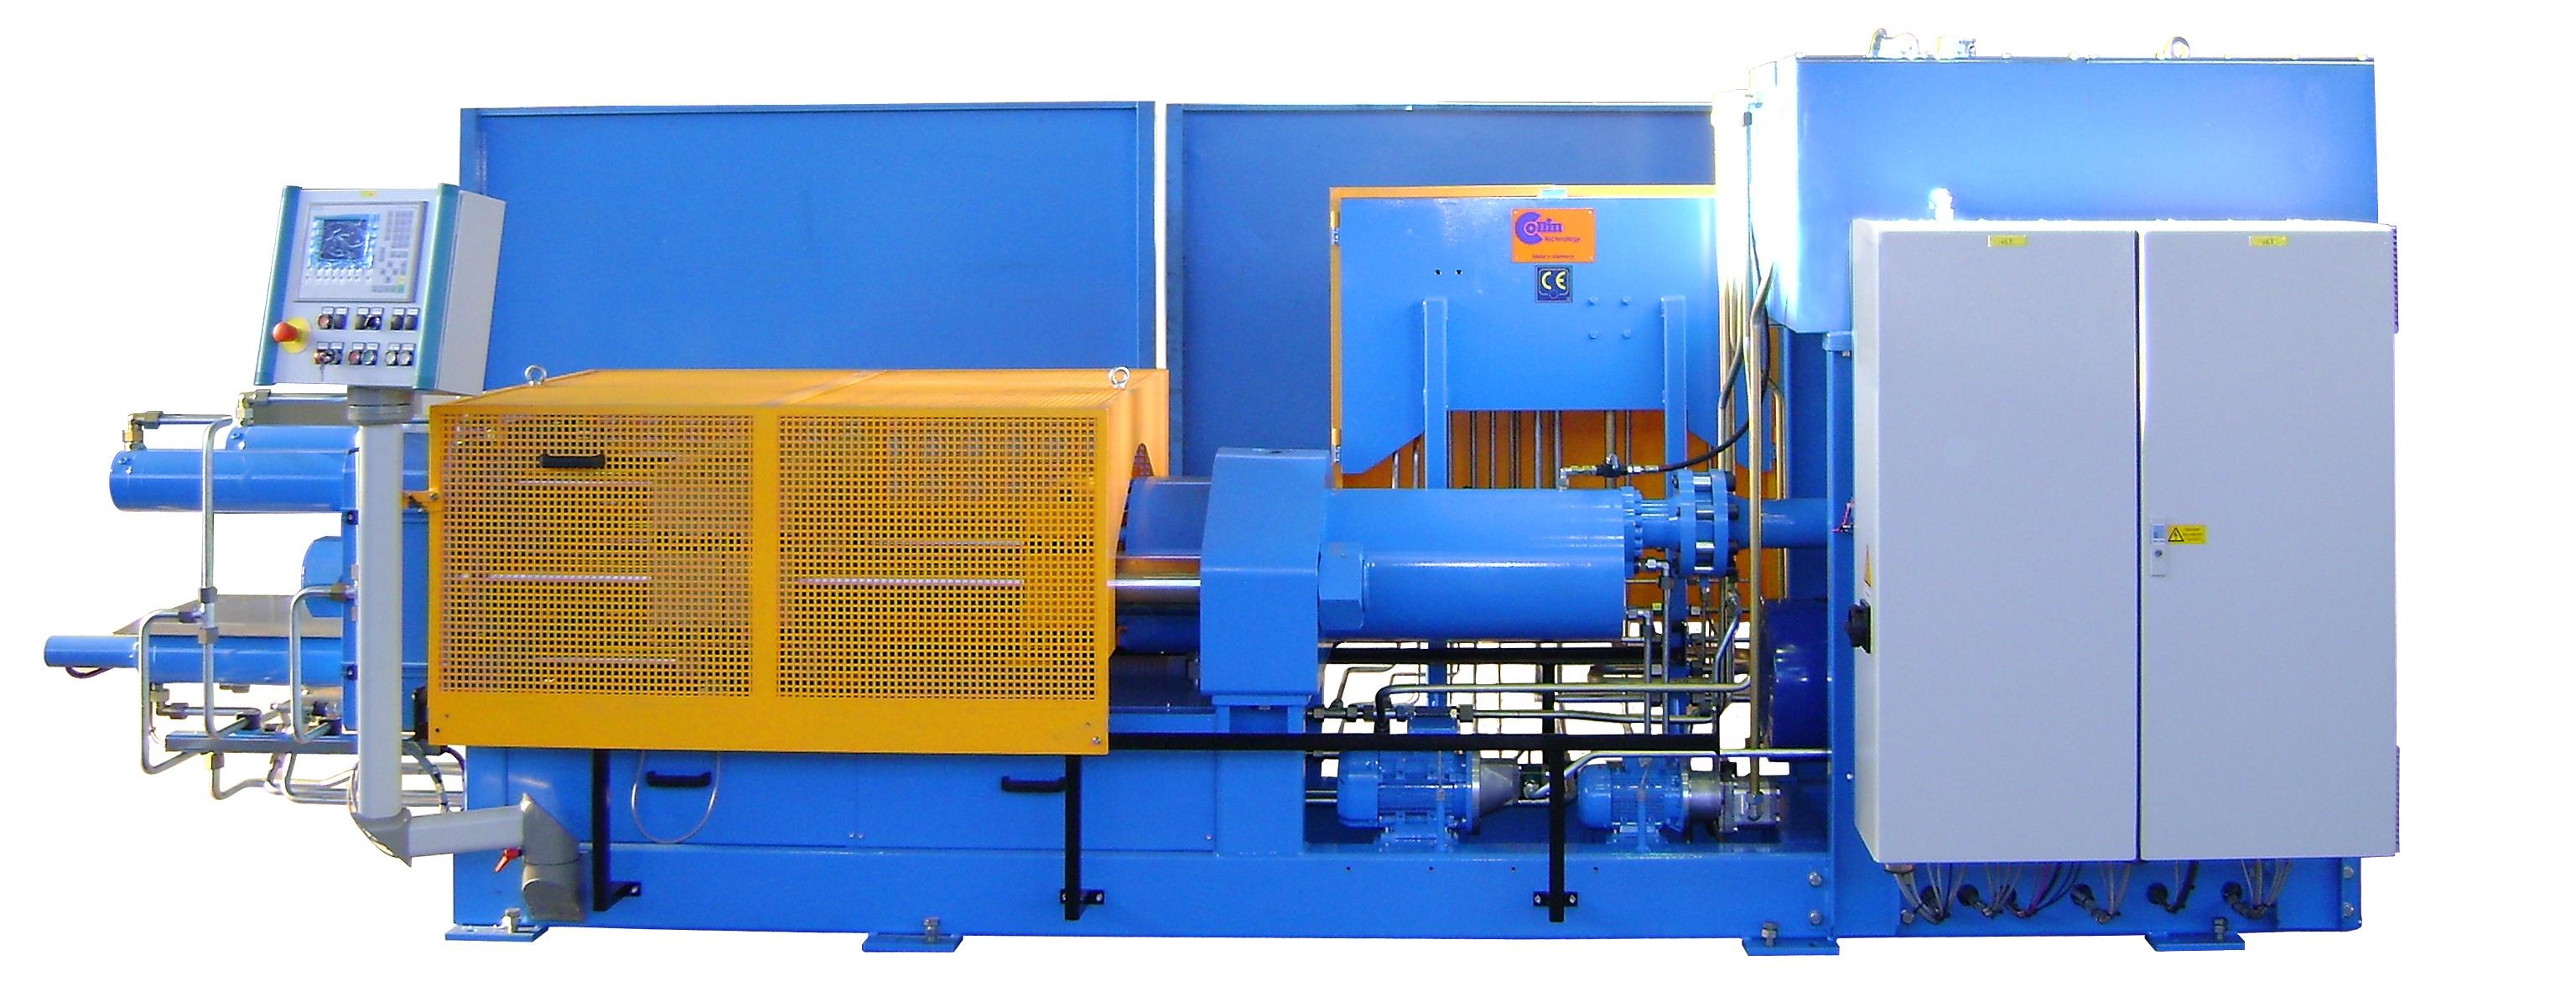 150 ton Strangpresse